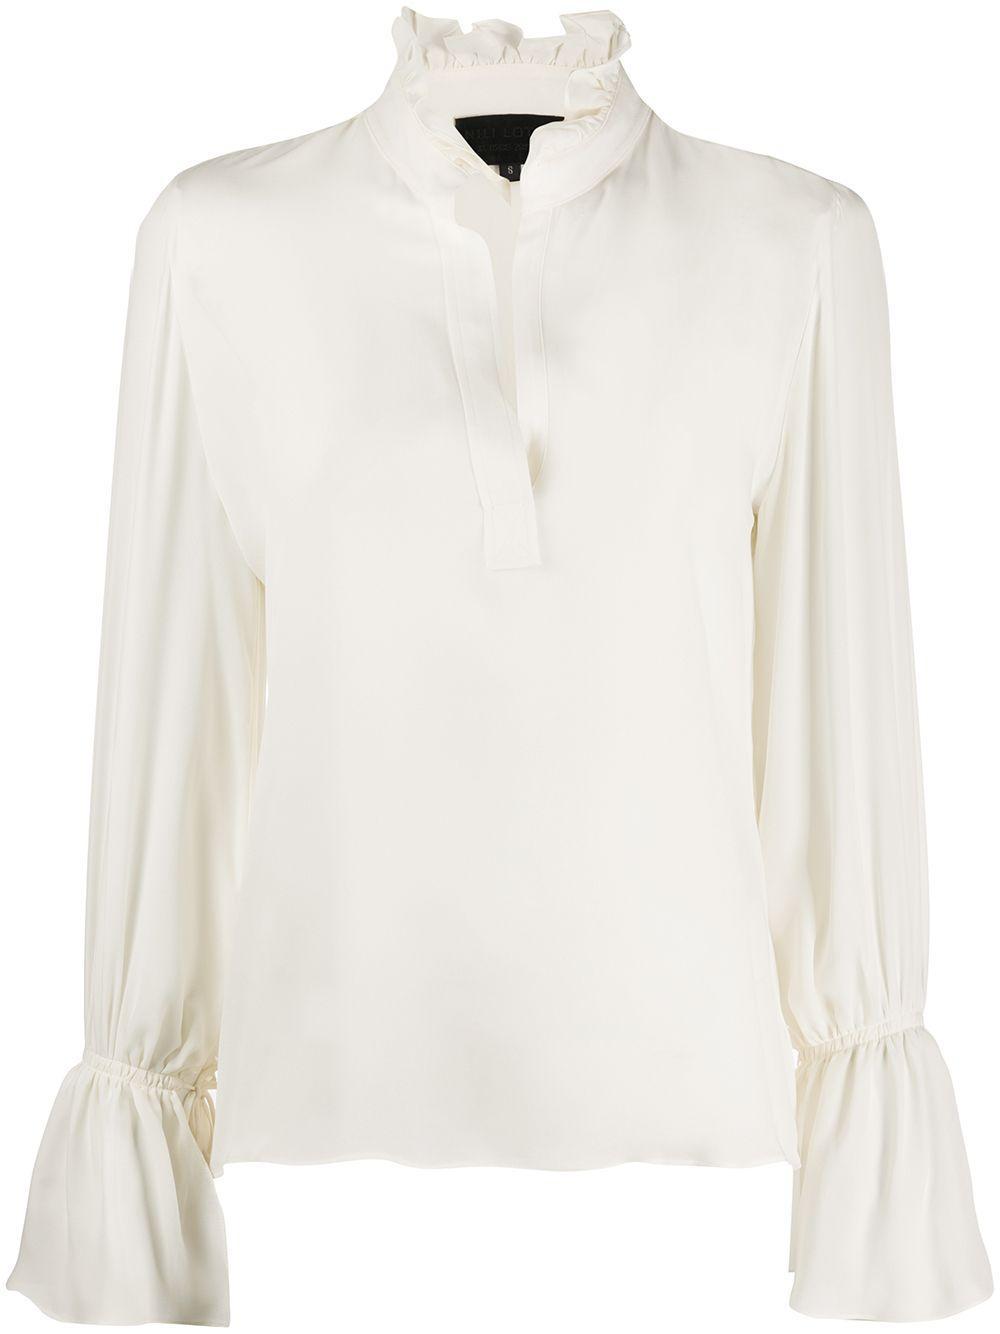 Nili Lotan блузка с оборками на воротнике